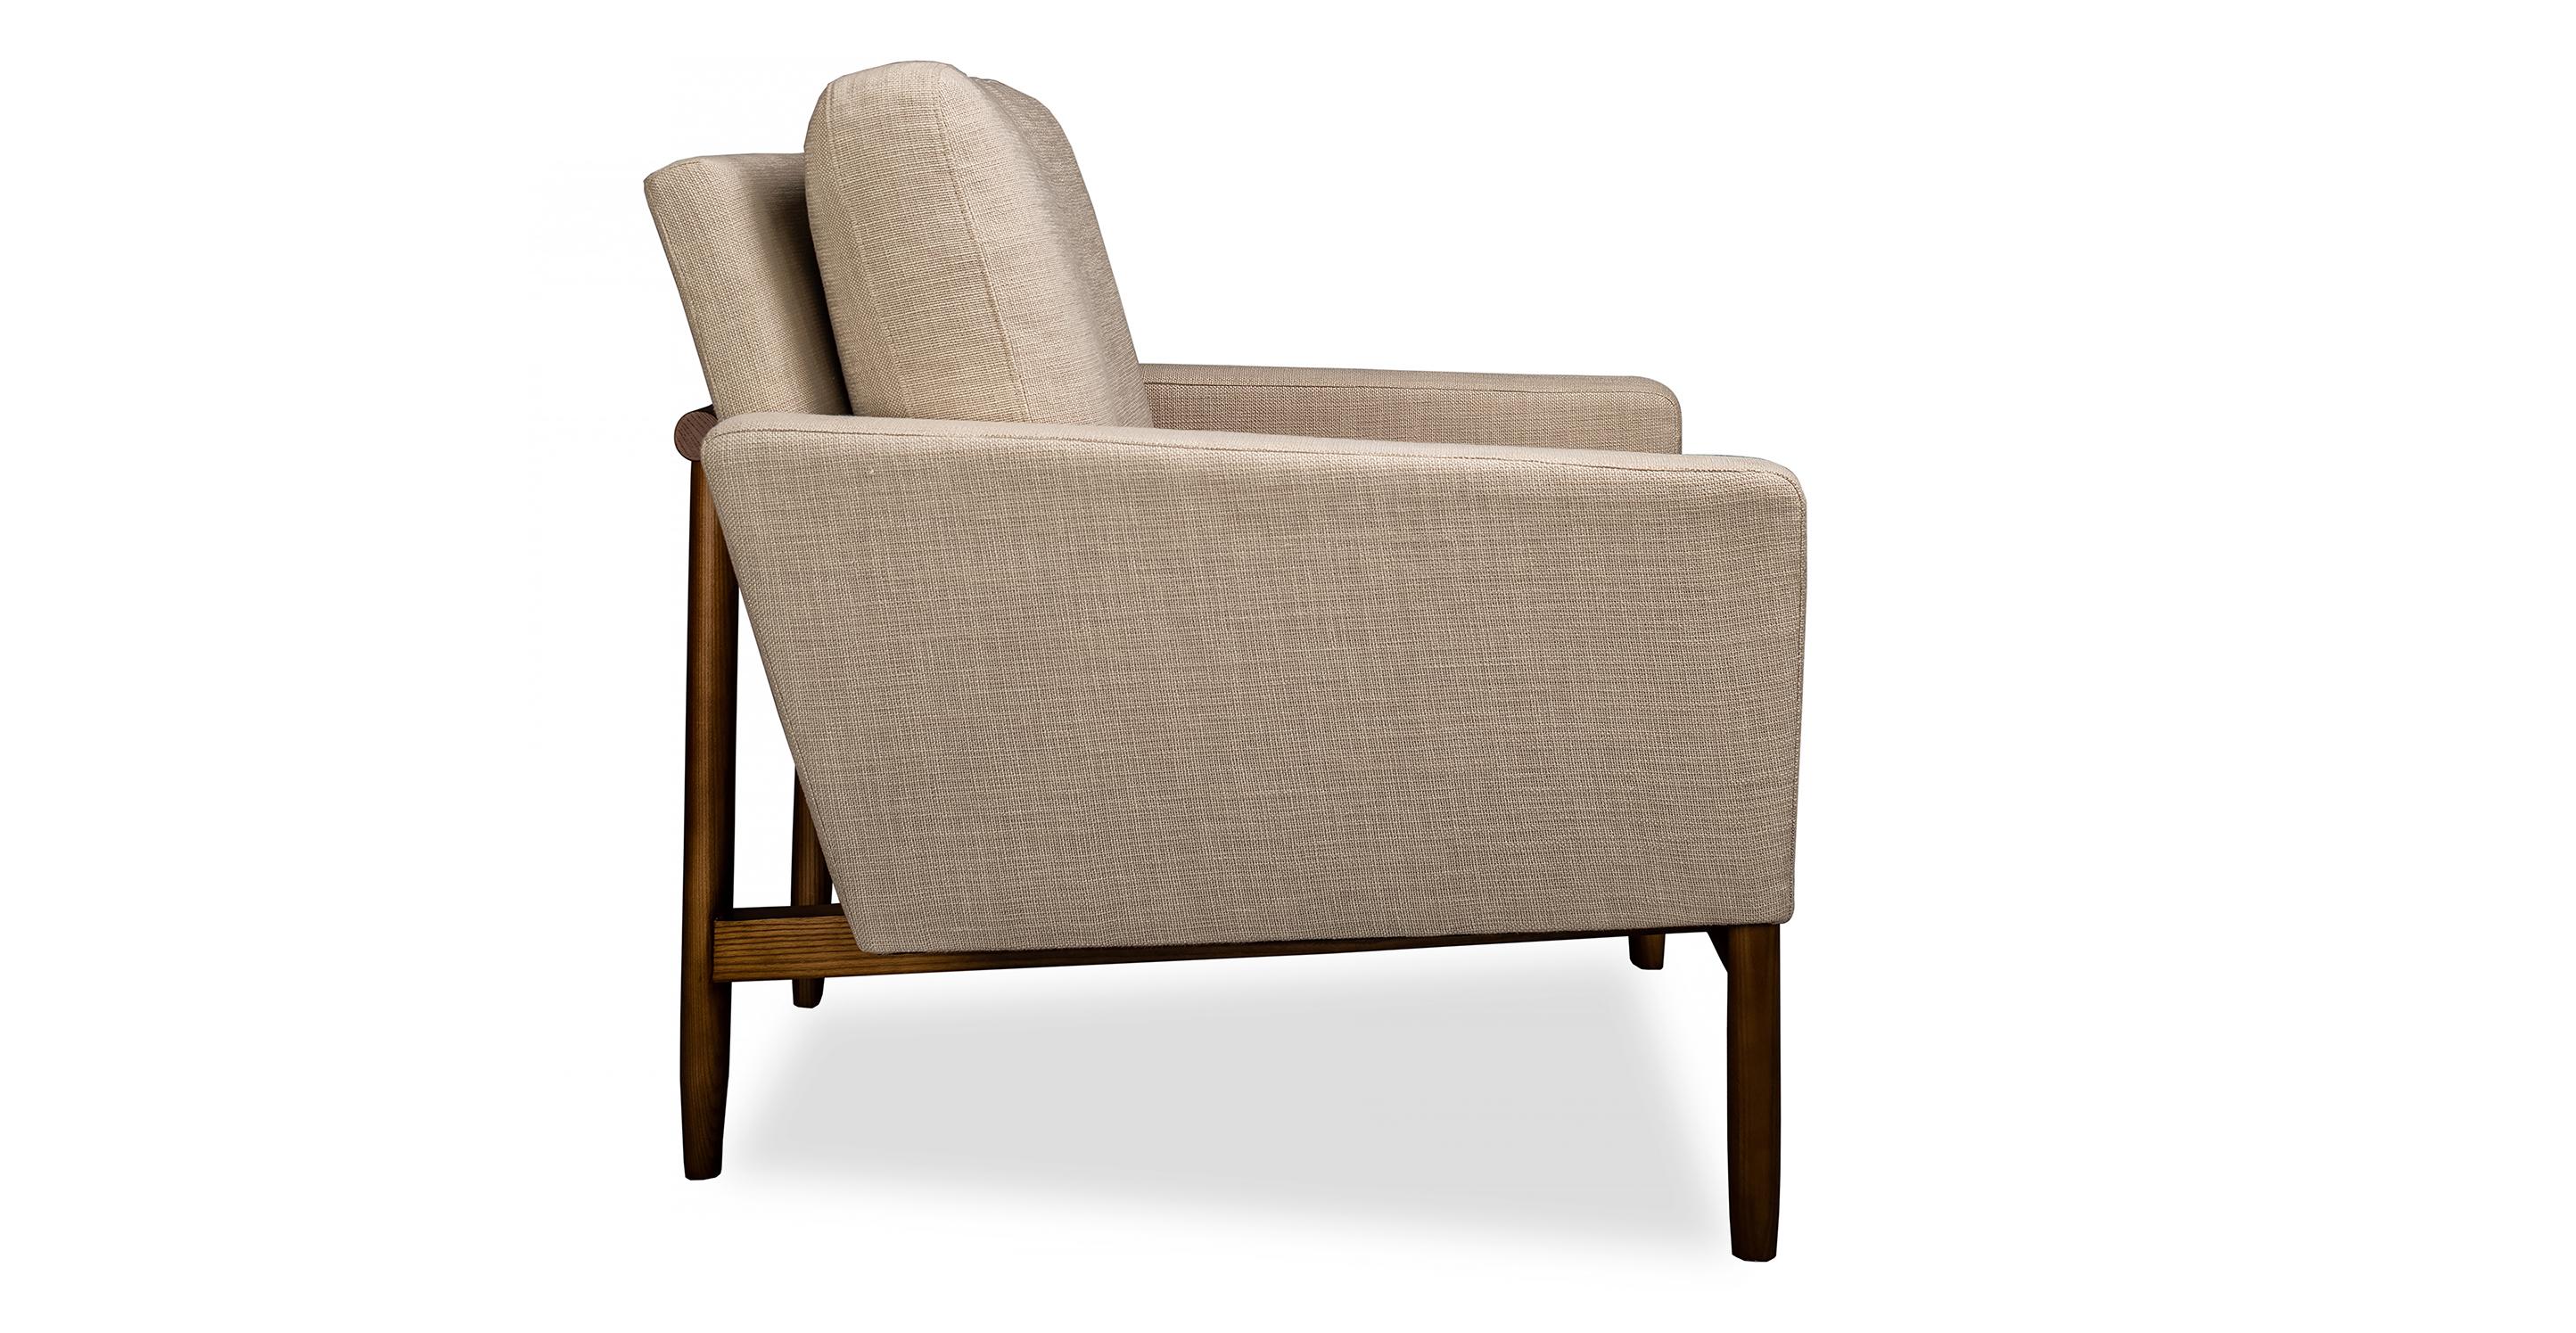 Stilt Danish Mod Chair, Urban Hemp/Walnut